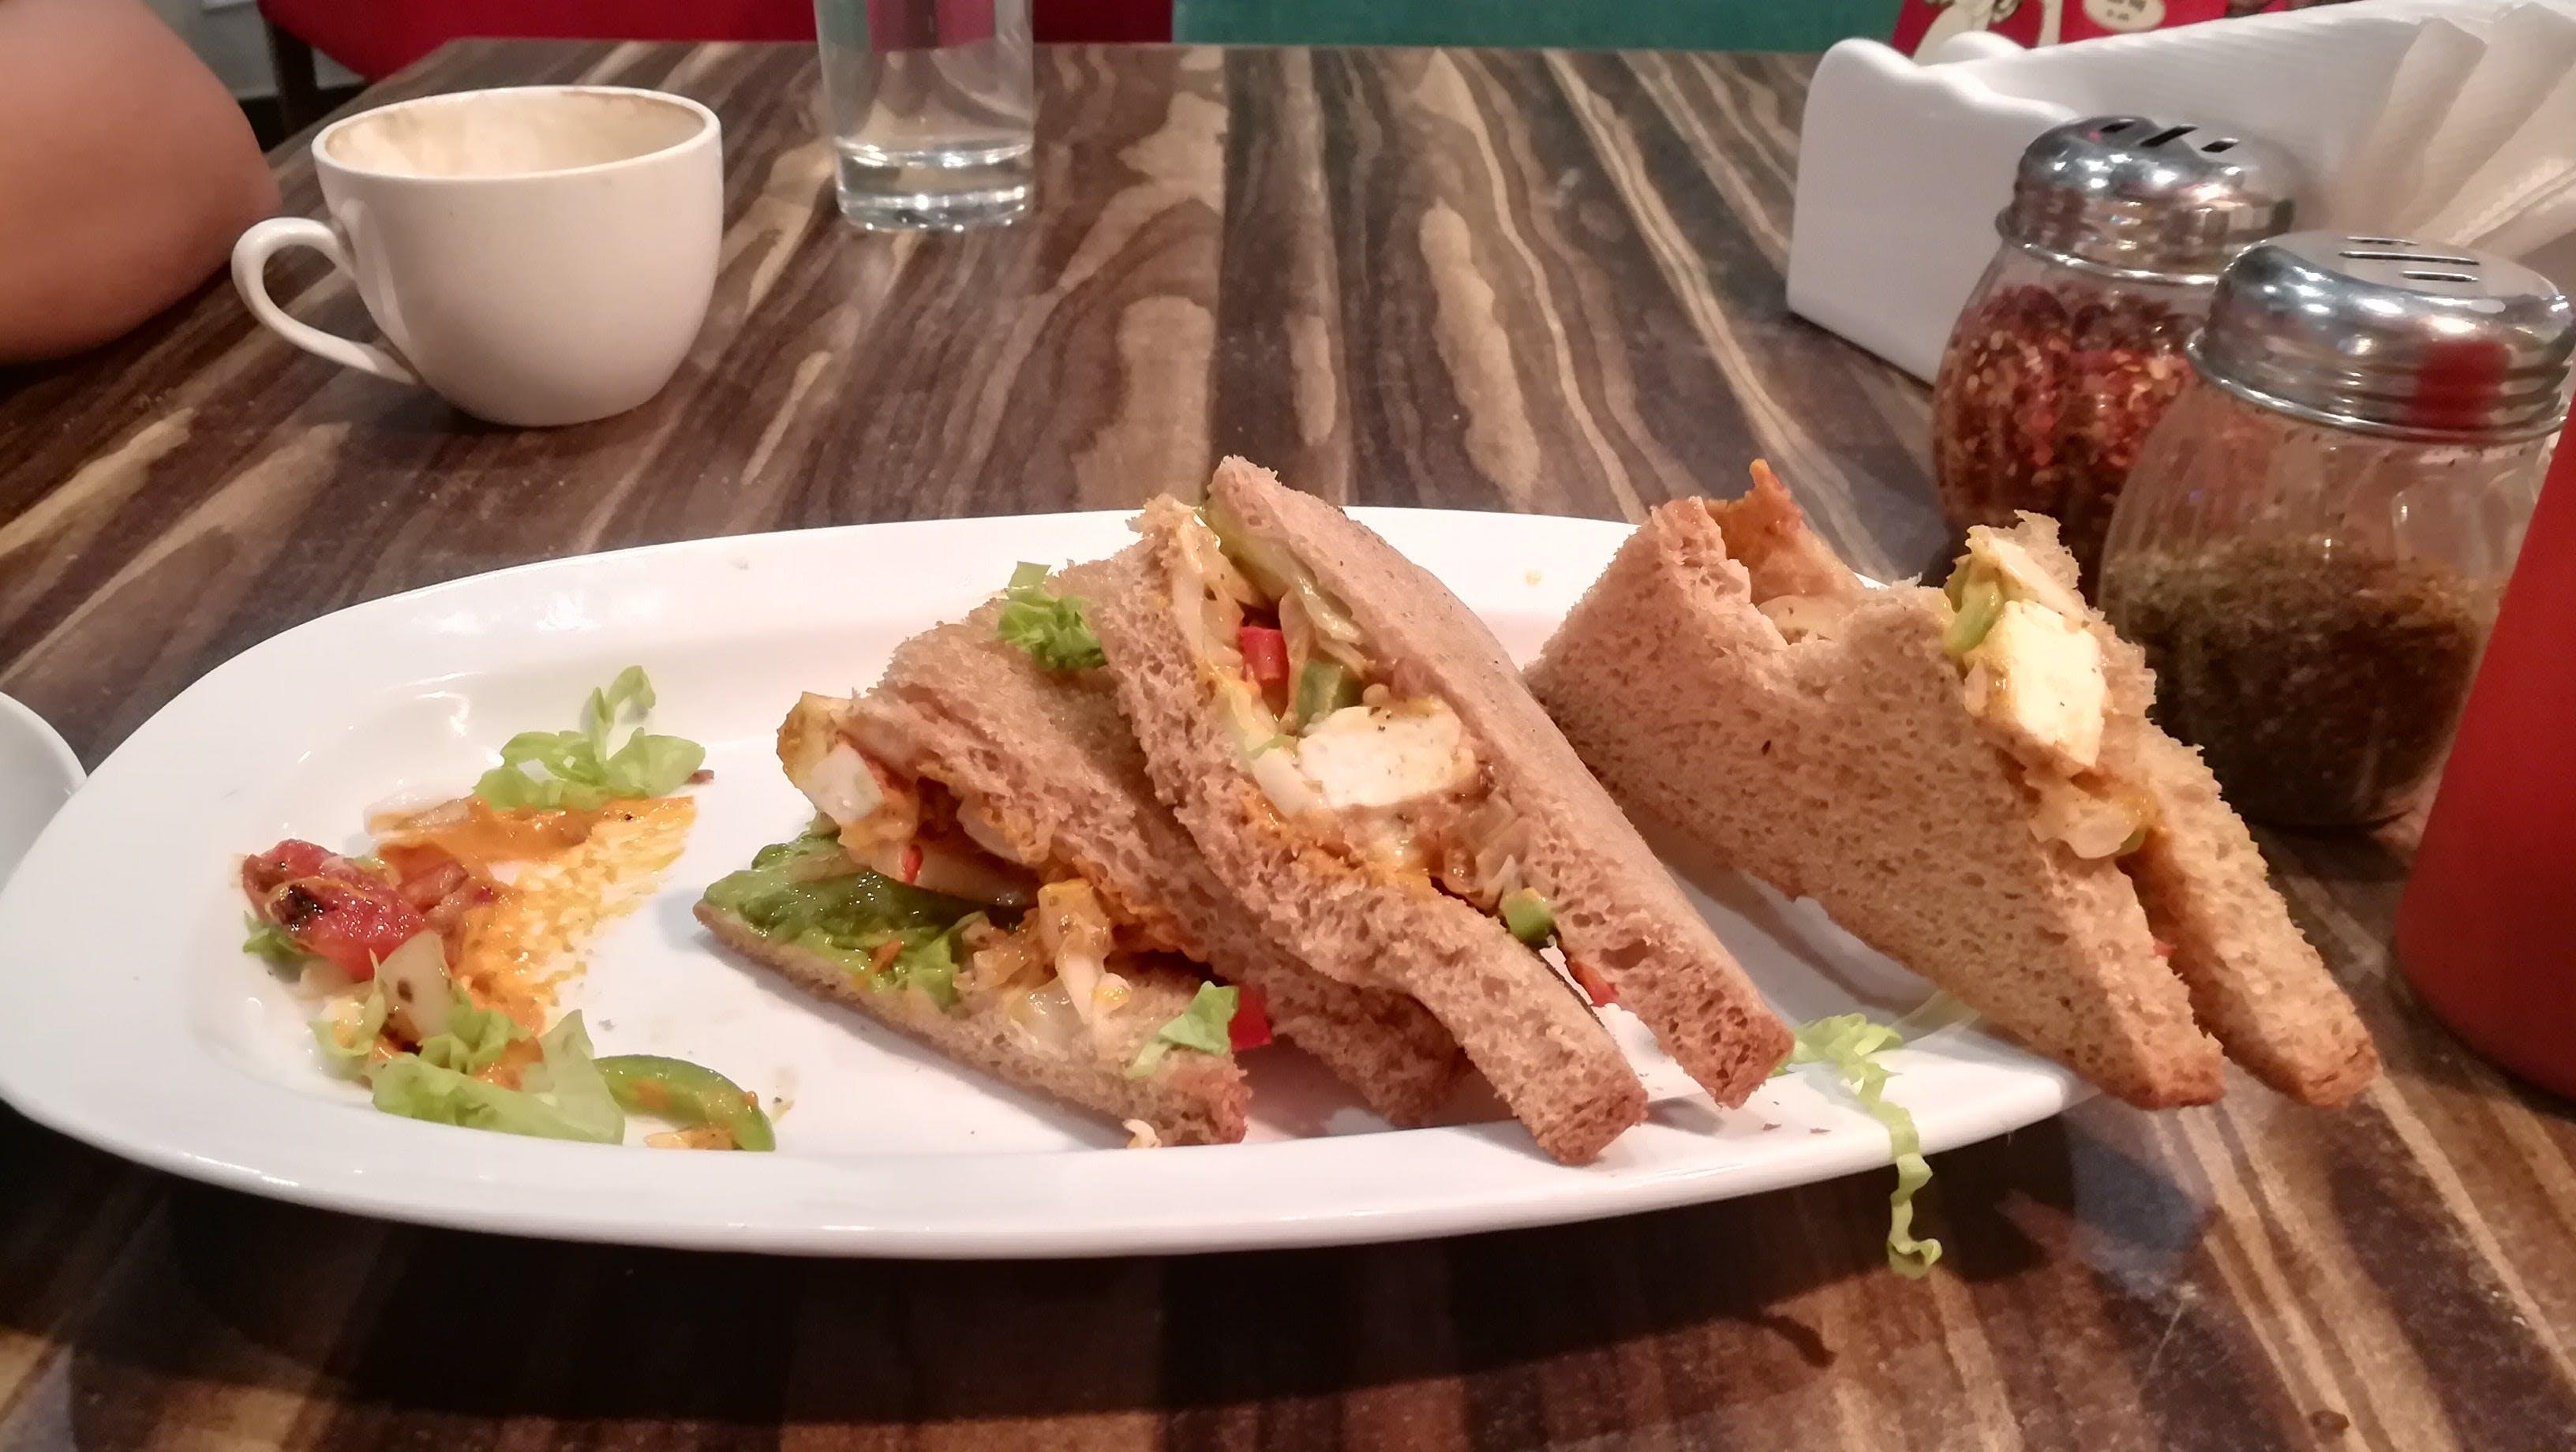 Free stock photo of fastfood, garlic bread, sandwich